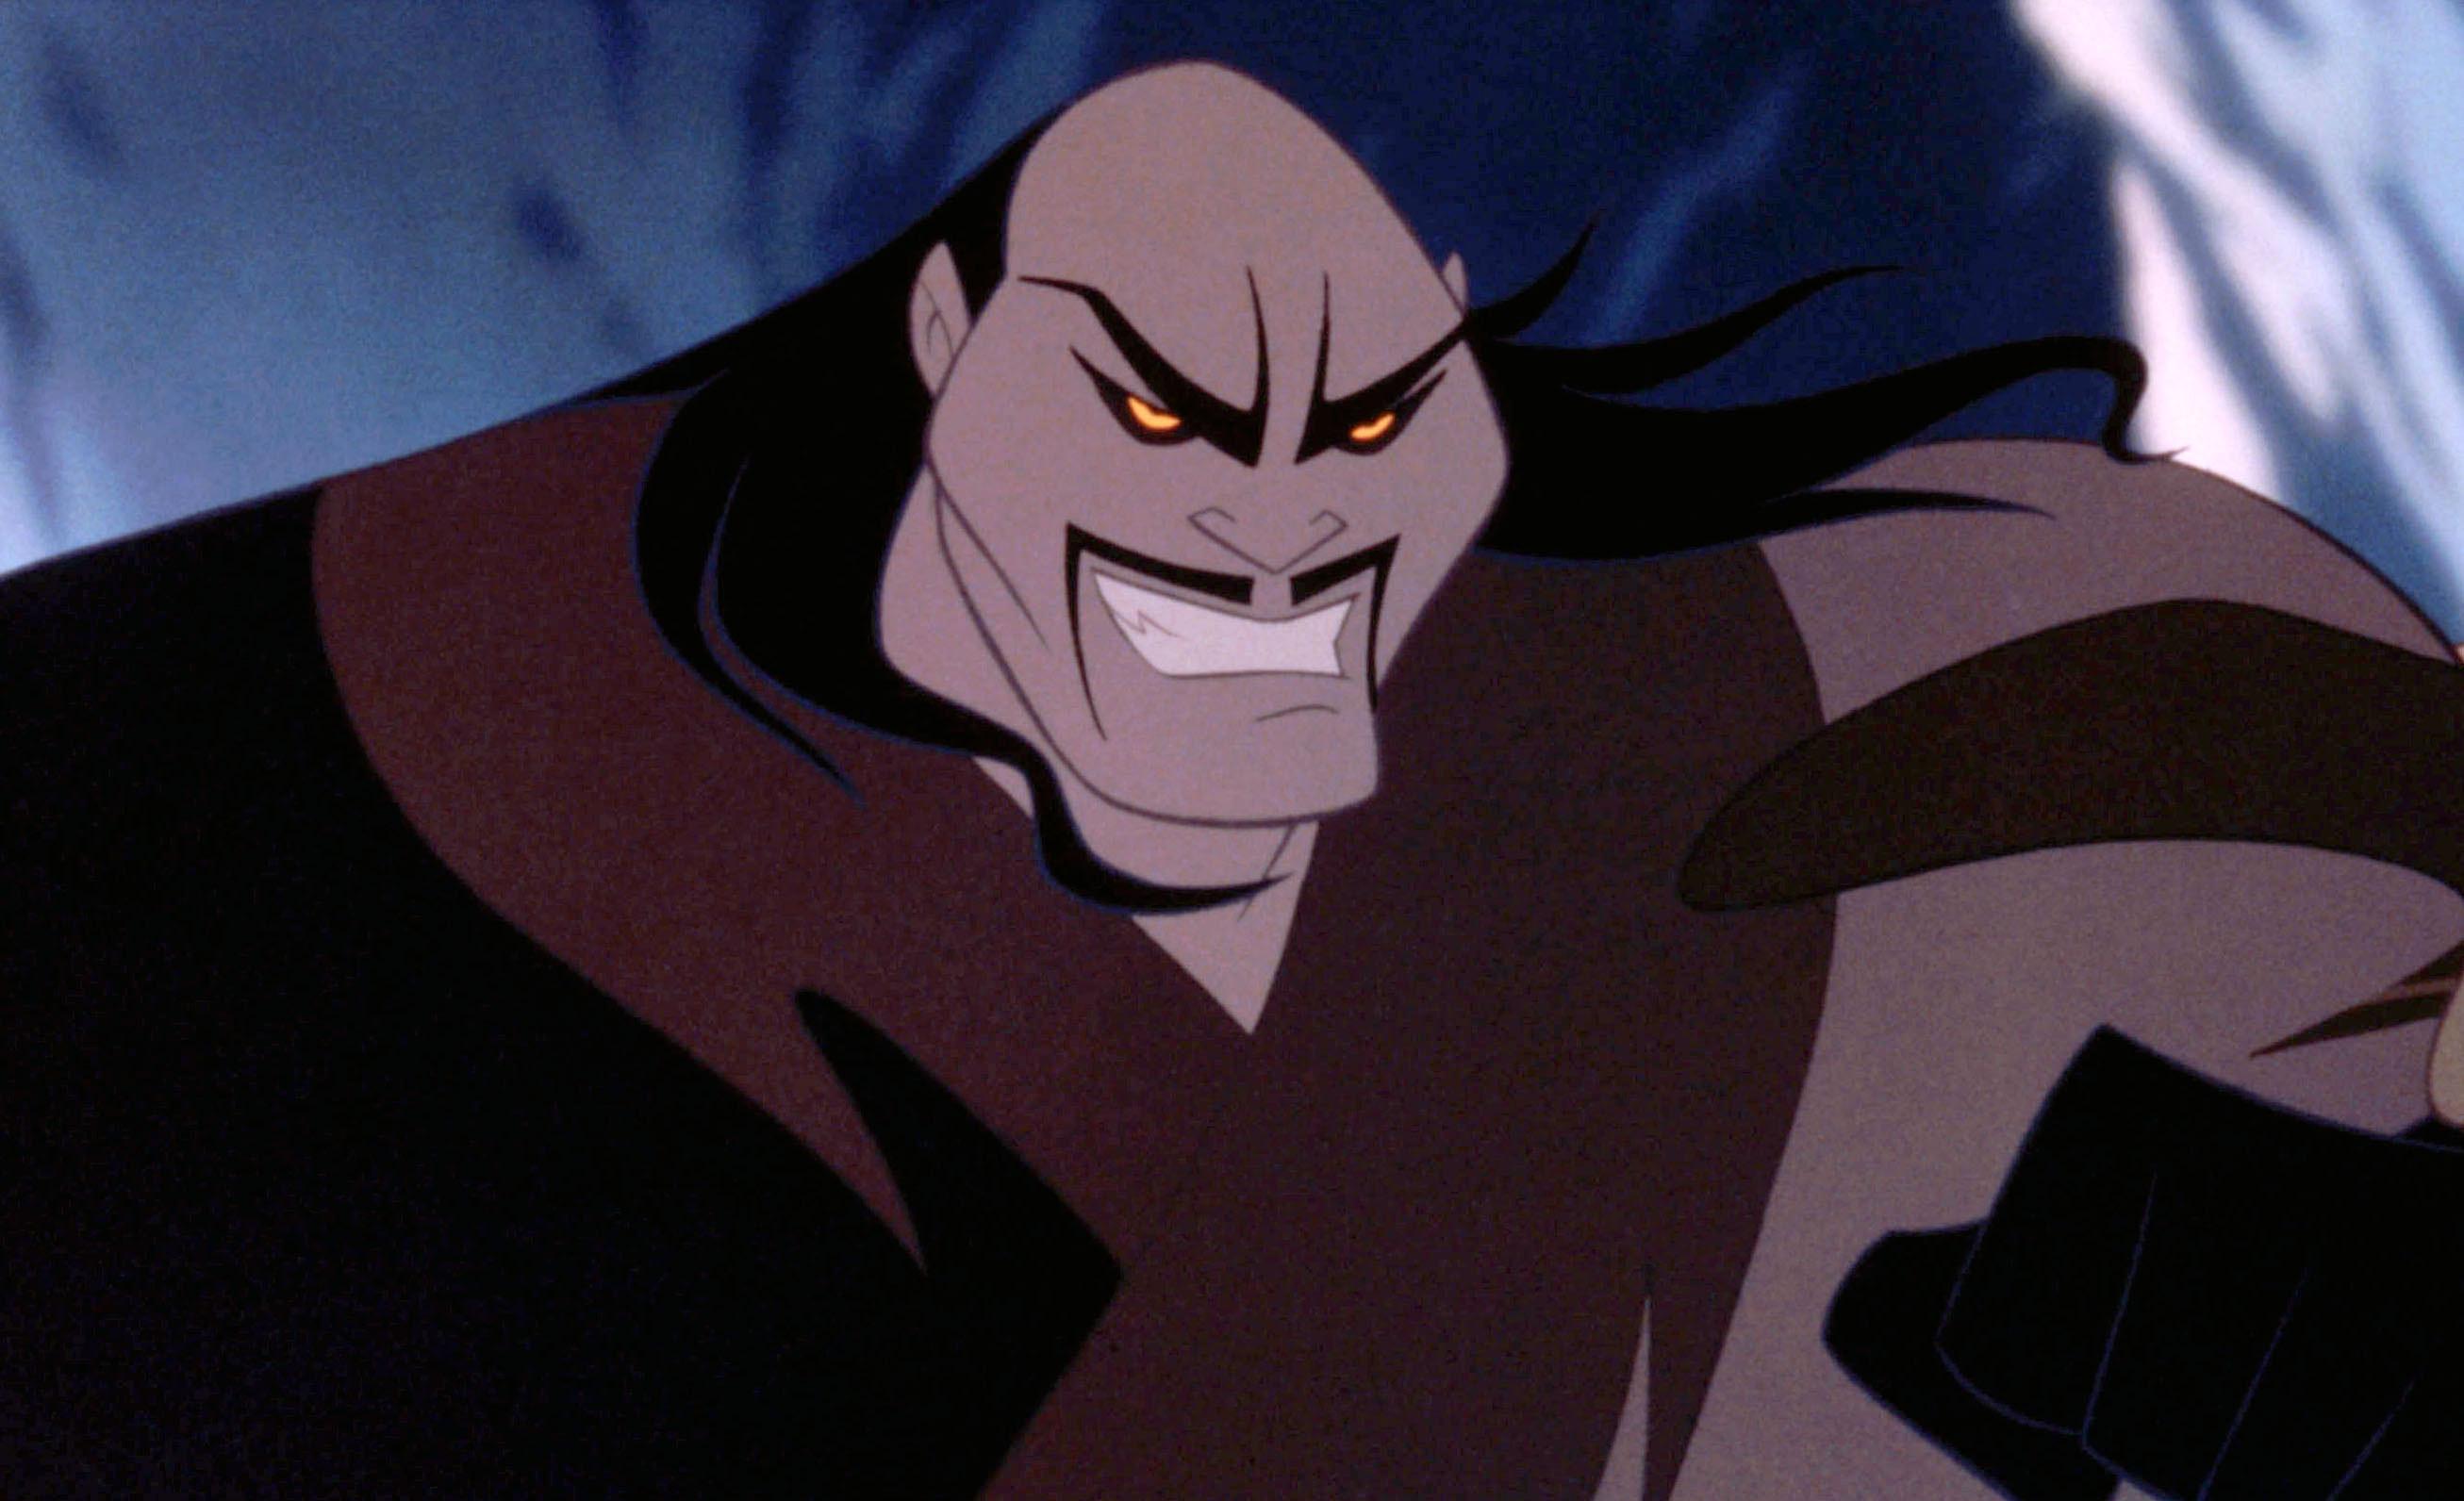 Shan-Yu with an evil grin